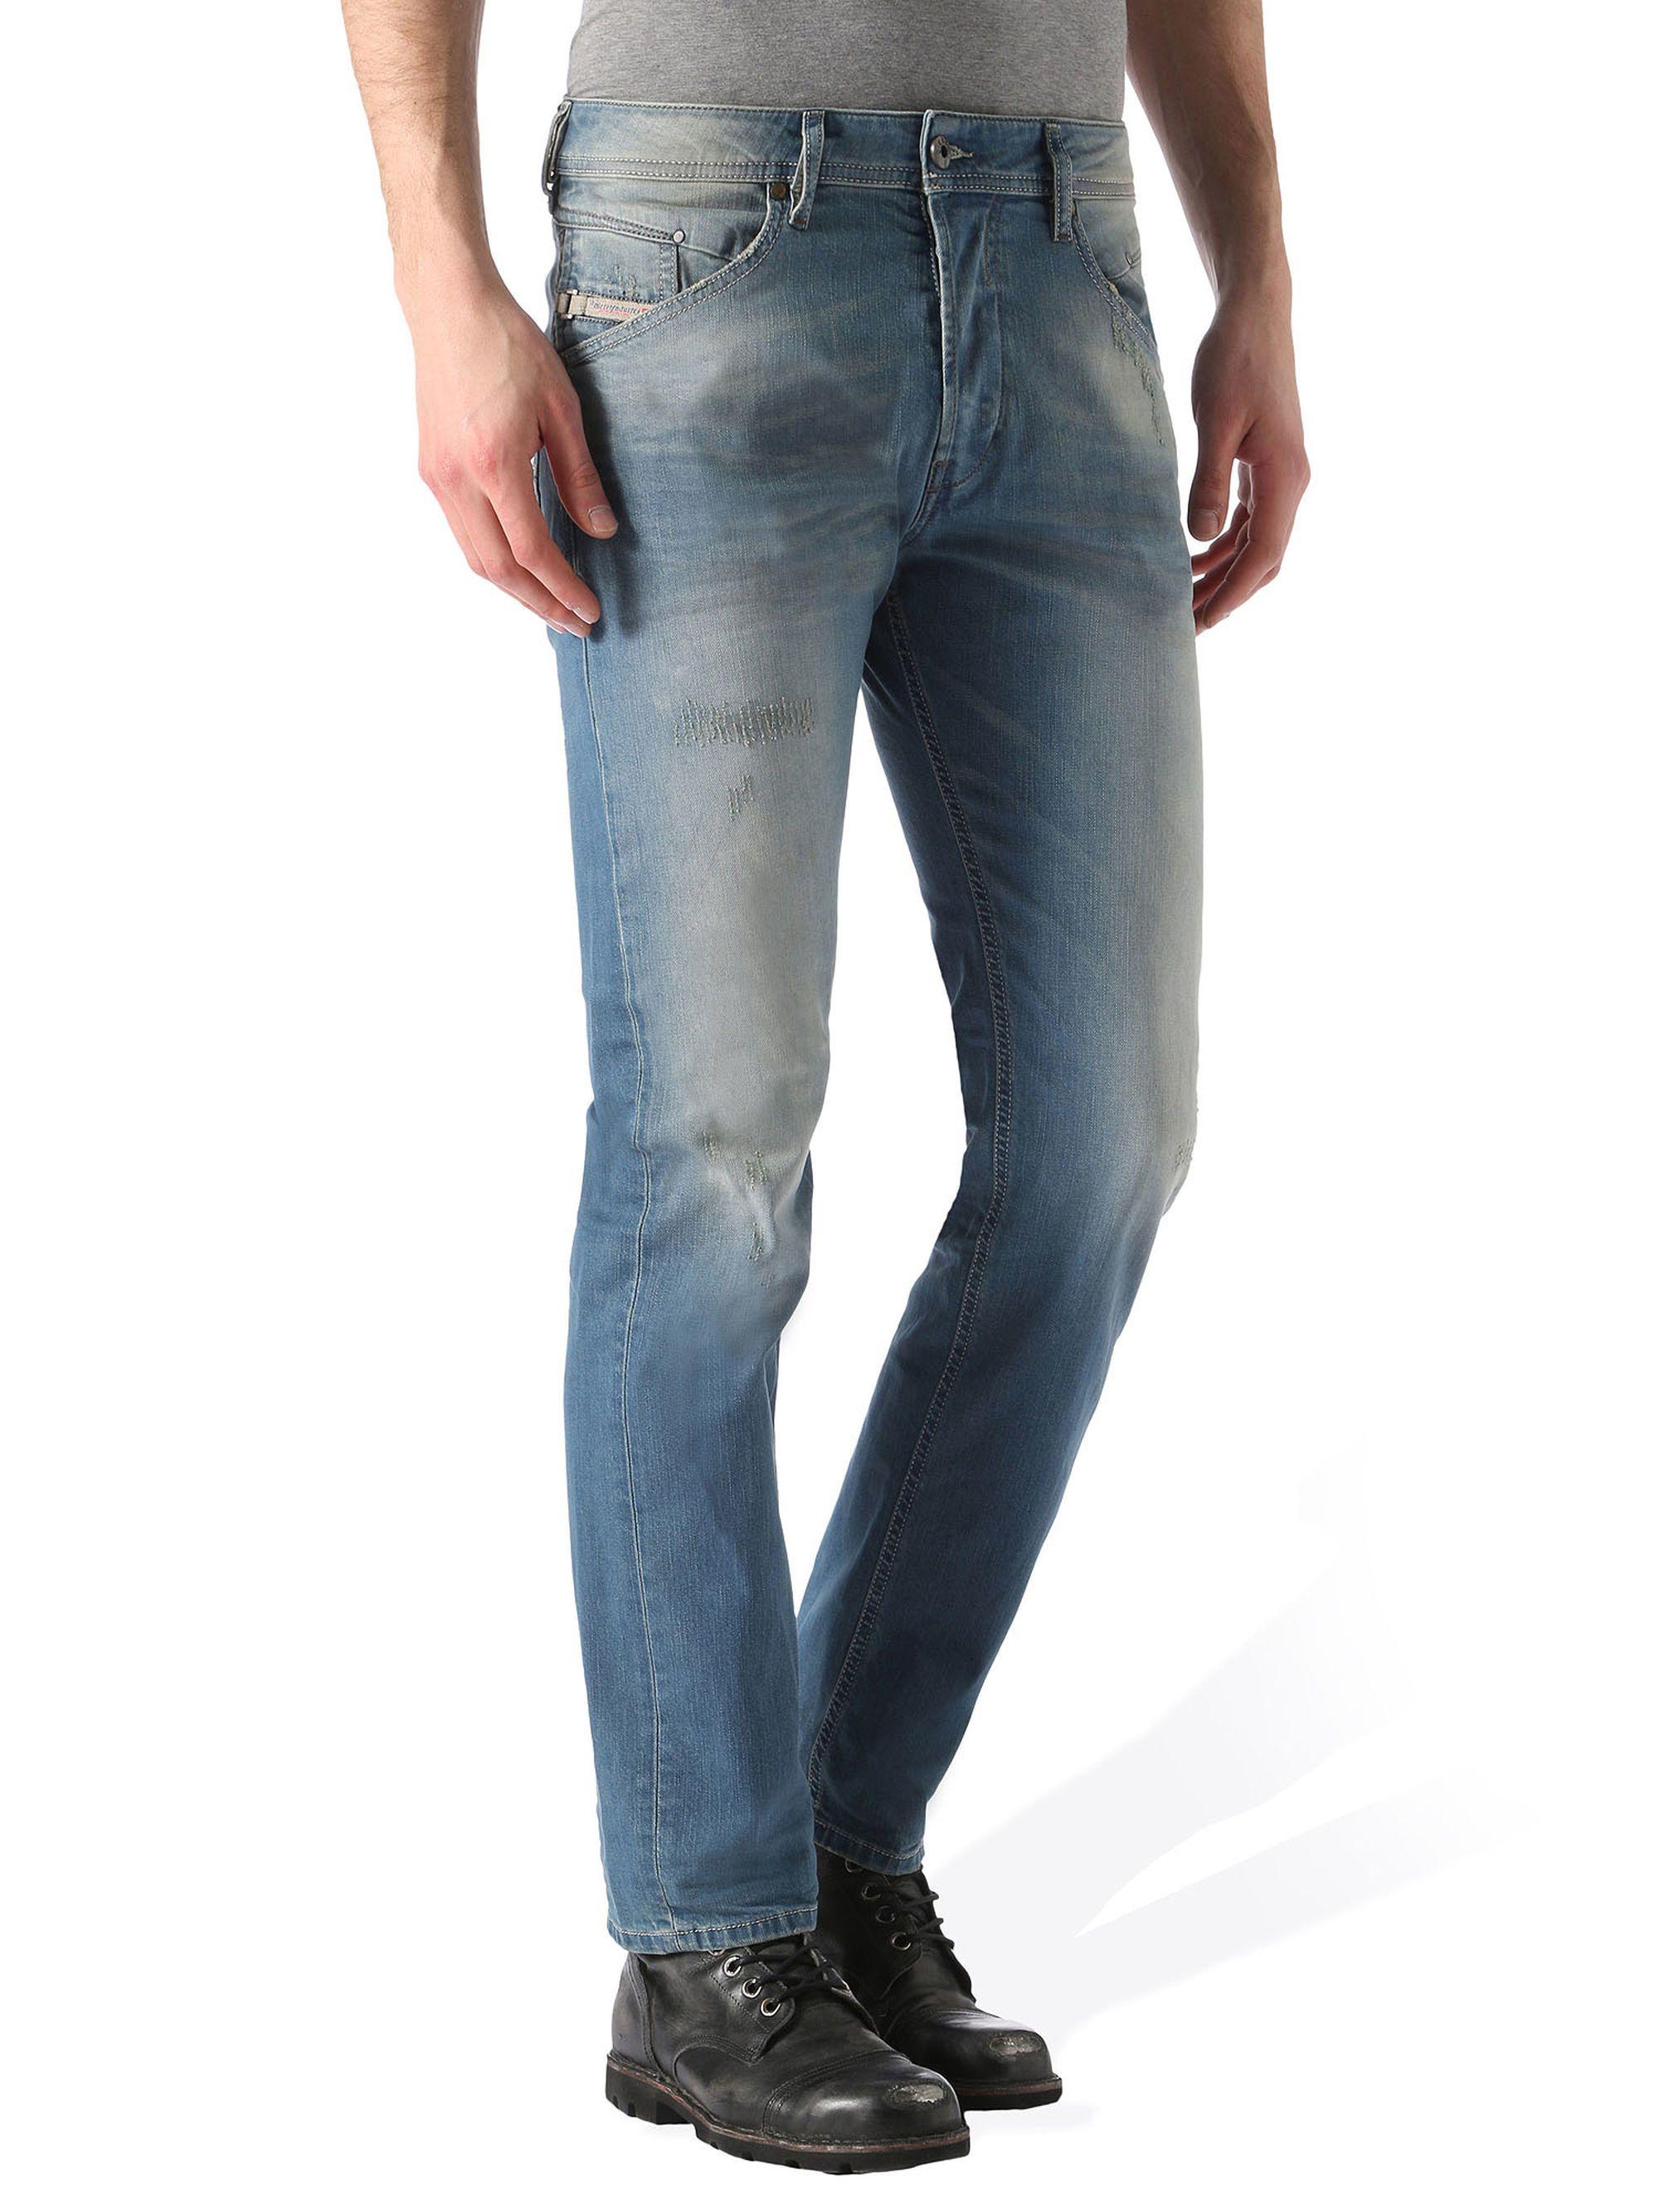 669853f3d33 Diesel BELTHER 0850U Tapered Regular Waist Stretch Jeans in Light Blue from  the Diesel Online Store  DieselOnlineStore  BELTHER0850U